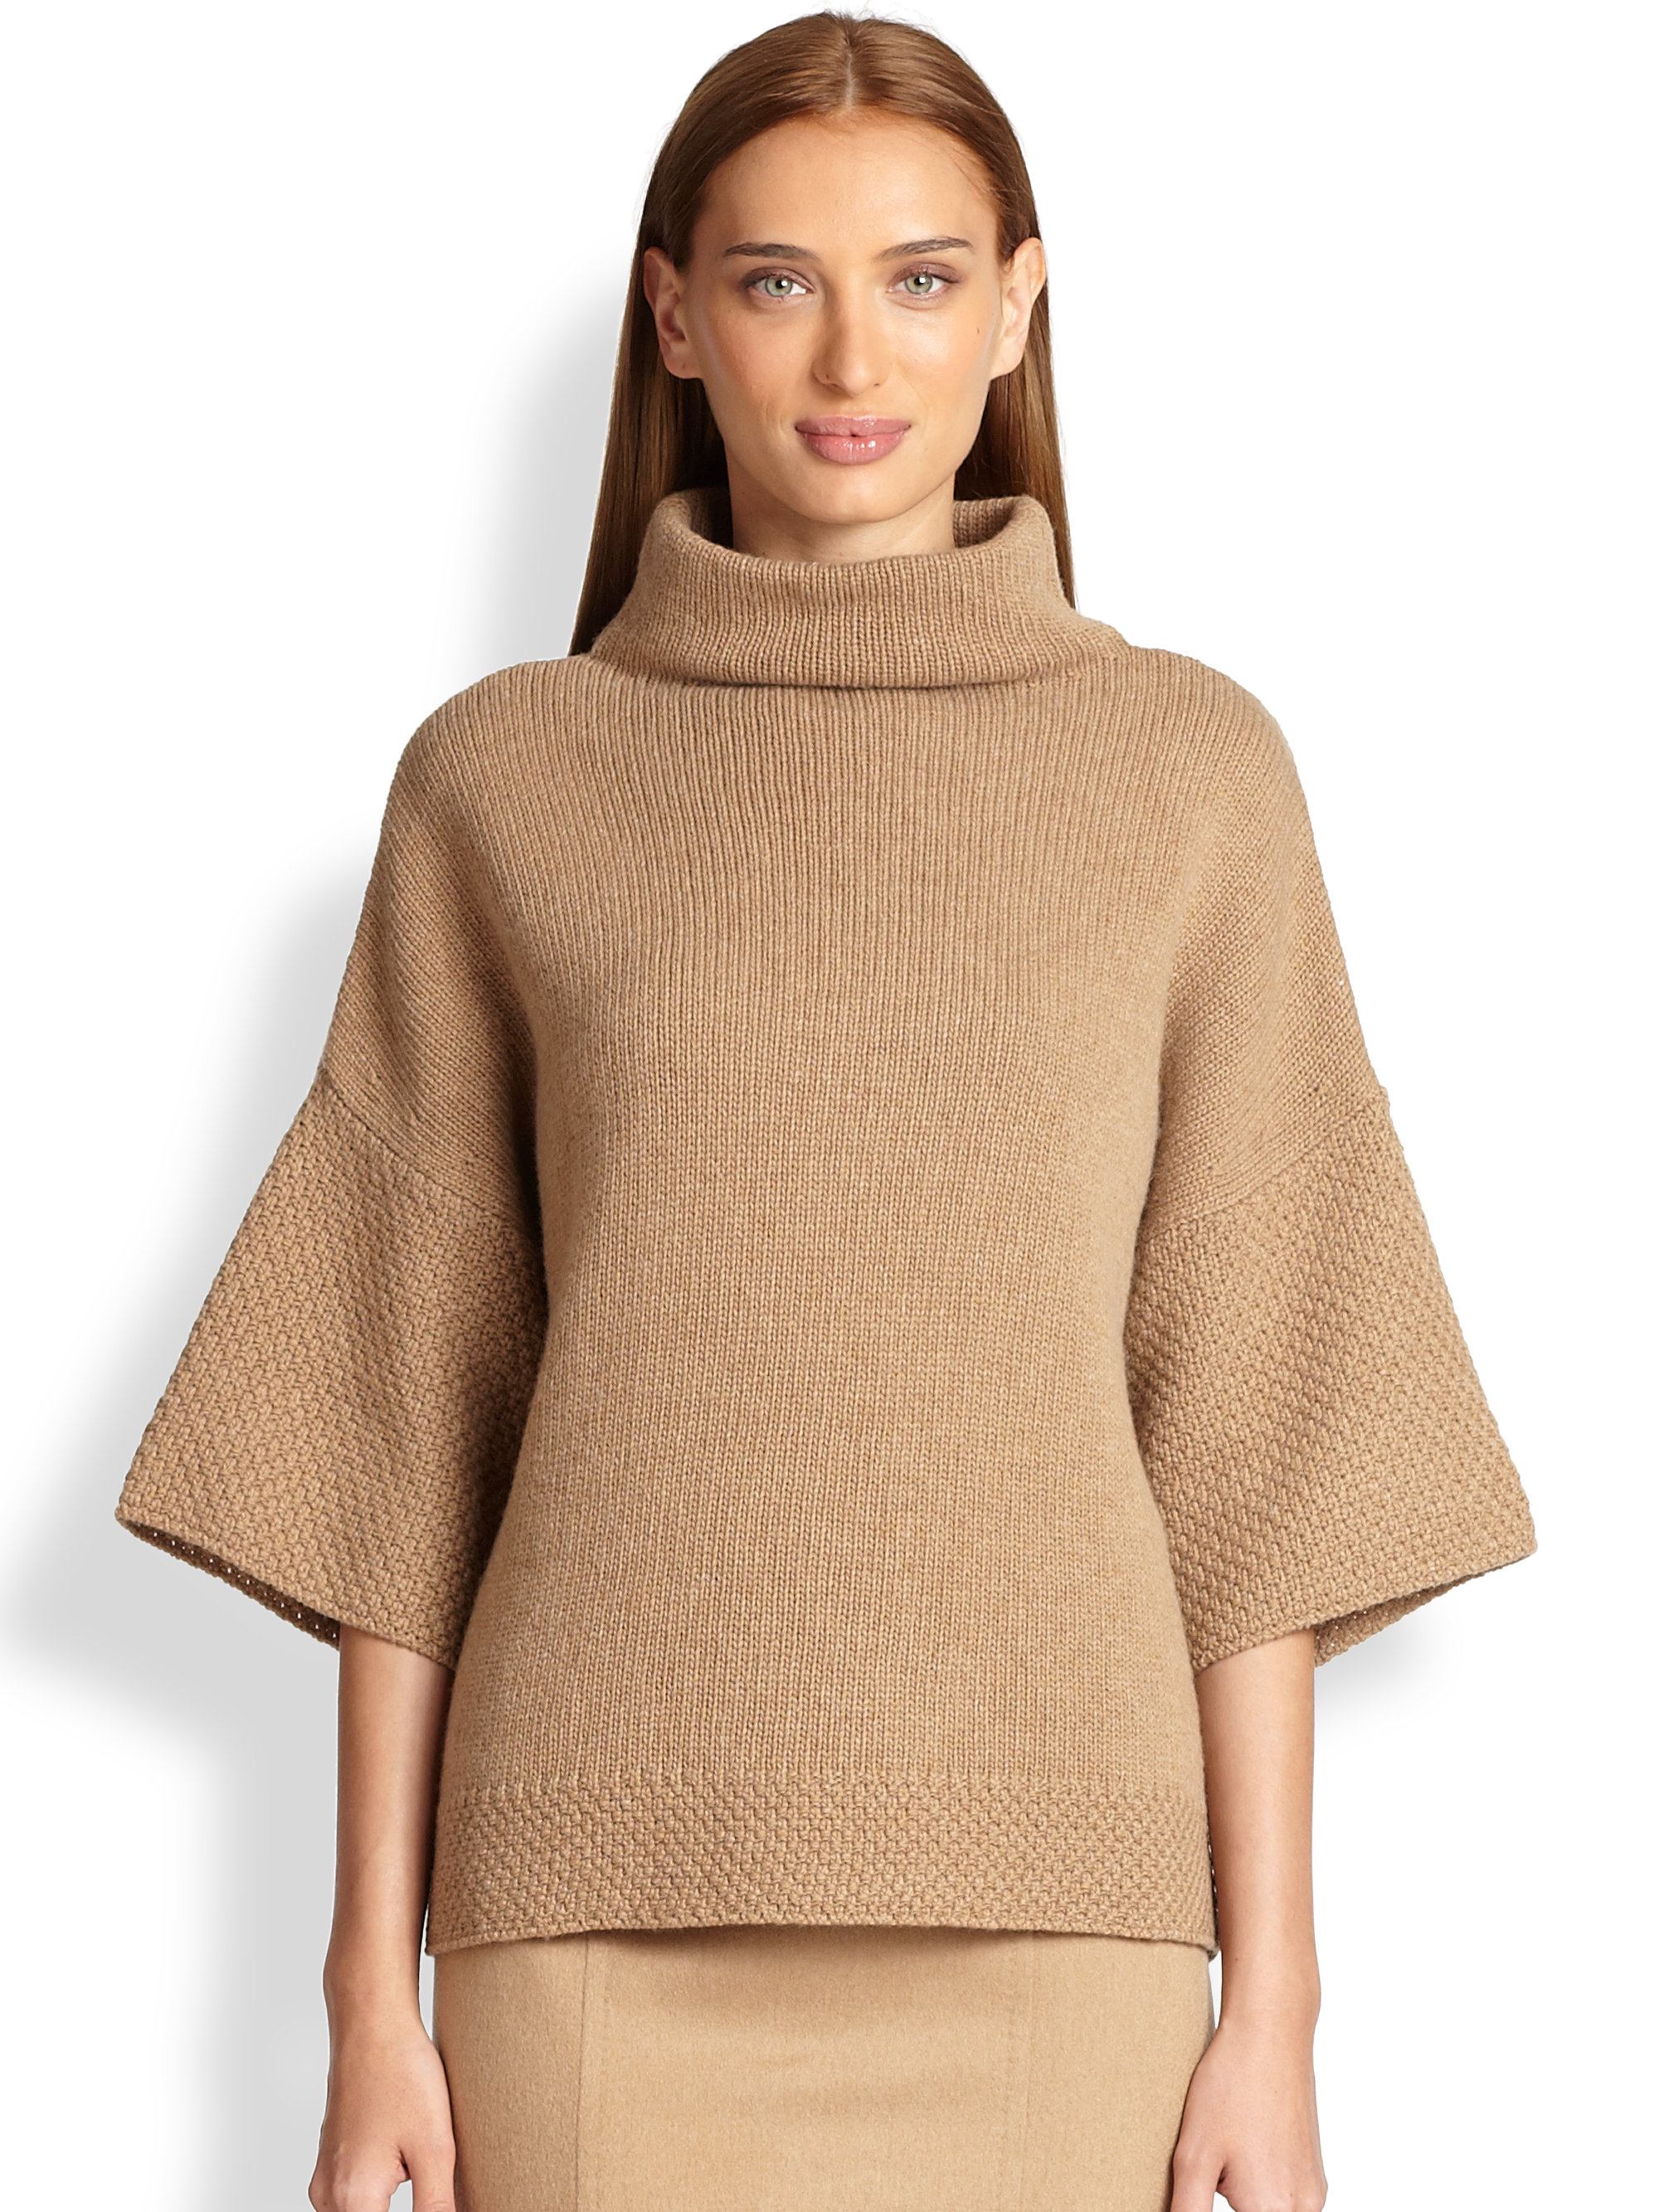 Max mara Titania Wool & Cashmere Sweater in Natural | Lyst